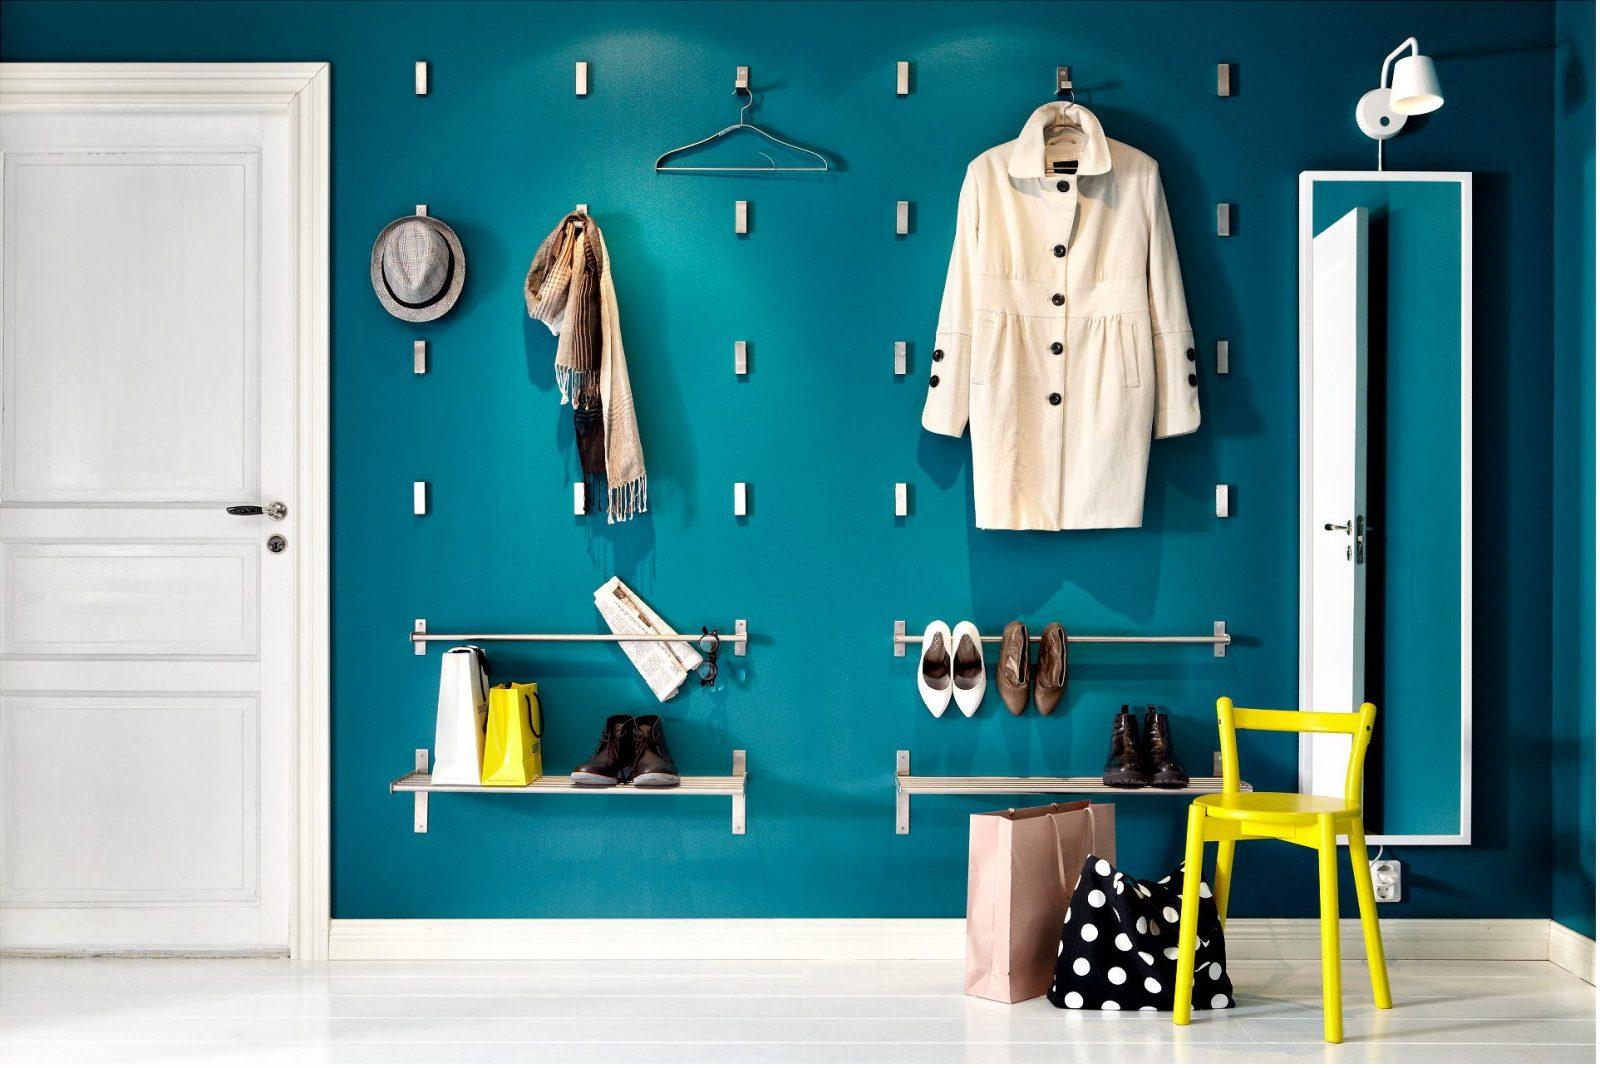 Fullsize Of Long Wall Shelf With Hooks